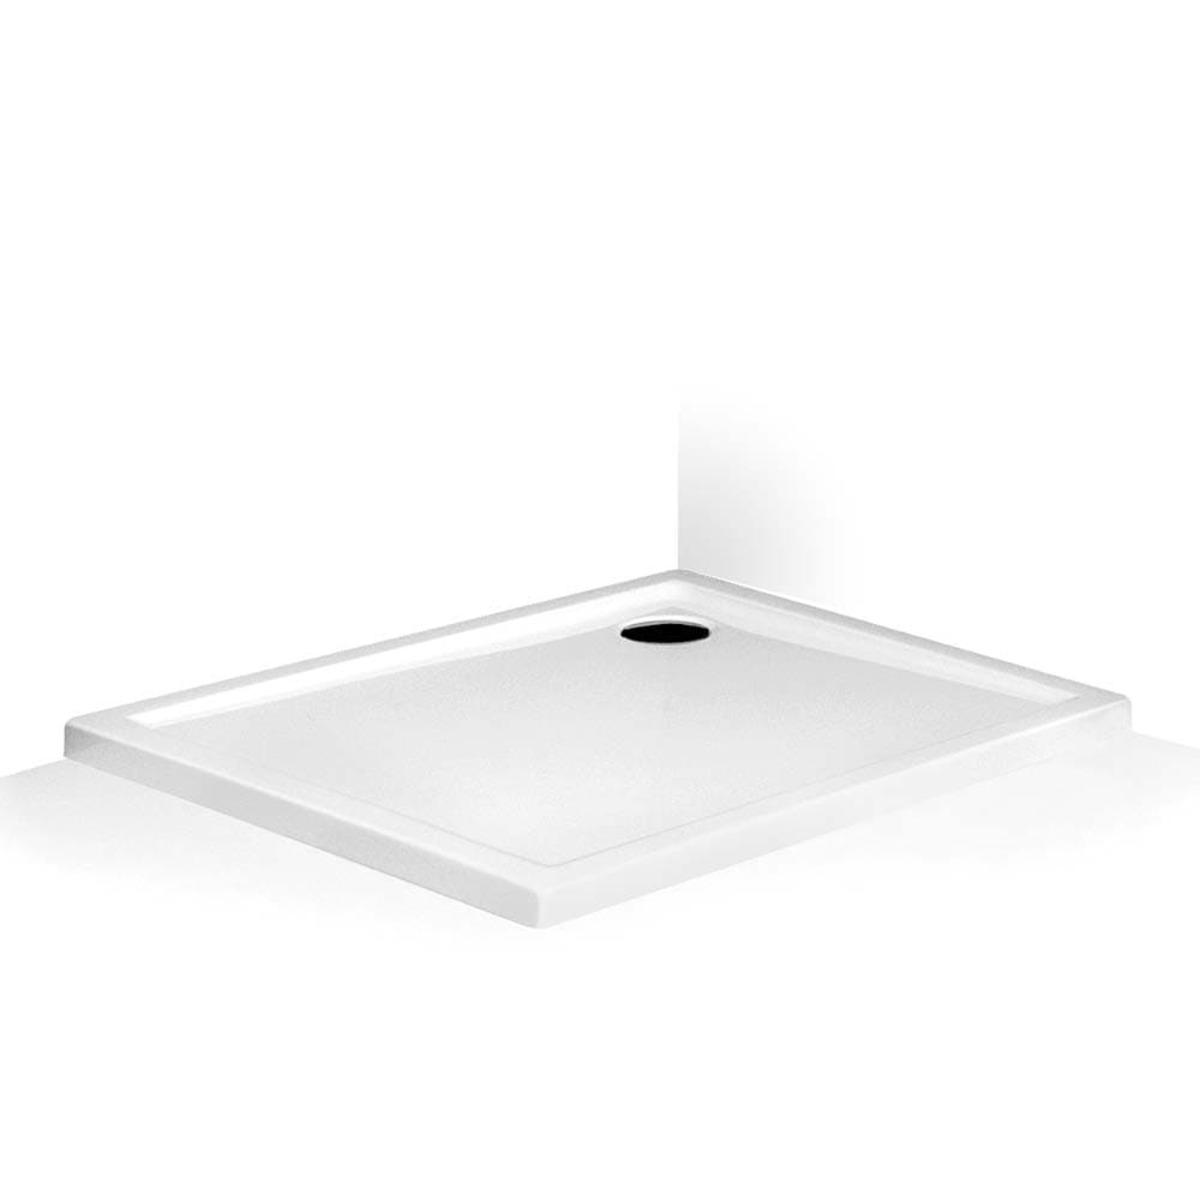 Sprchová vanička obdélníková Roth 150x80 cm akrylát 8000251